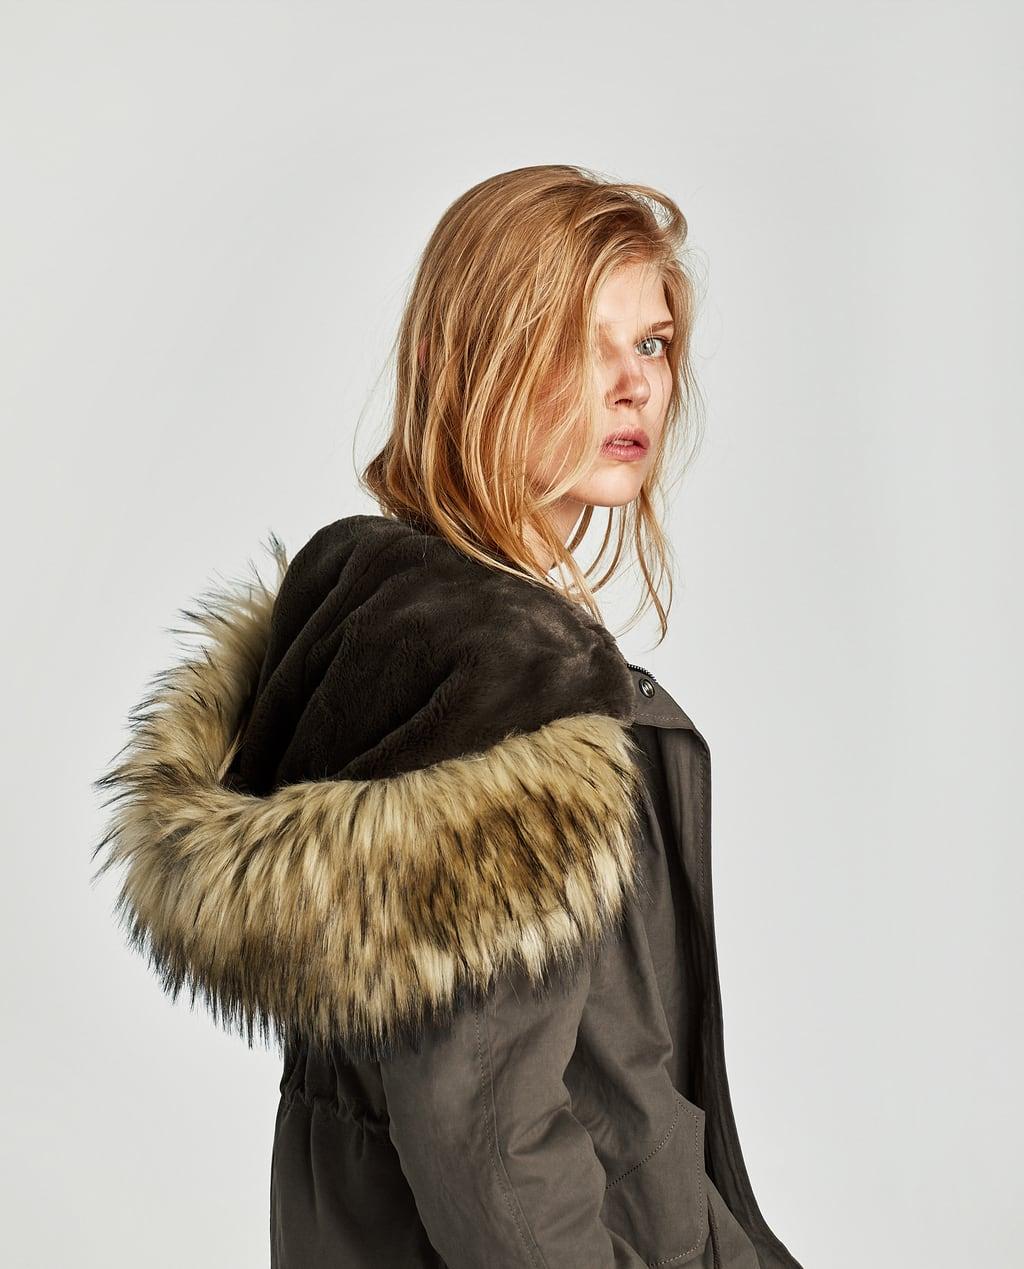 Zaracienta: Zara por fin de rebajas, primer objetivo: un abrigo